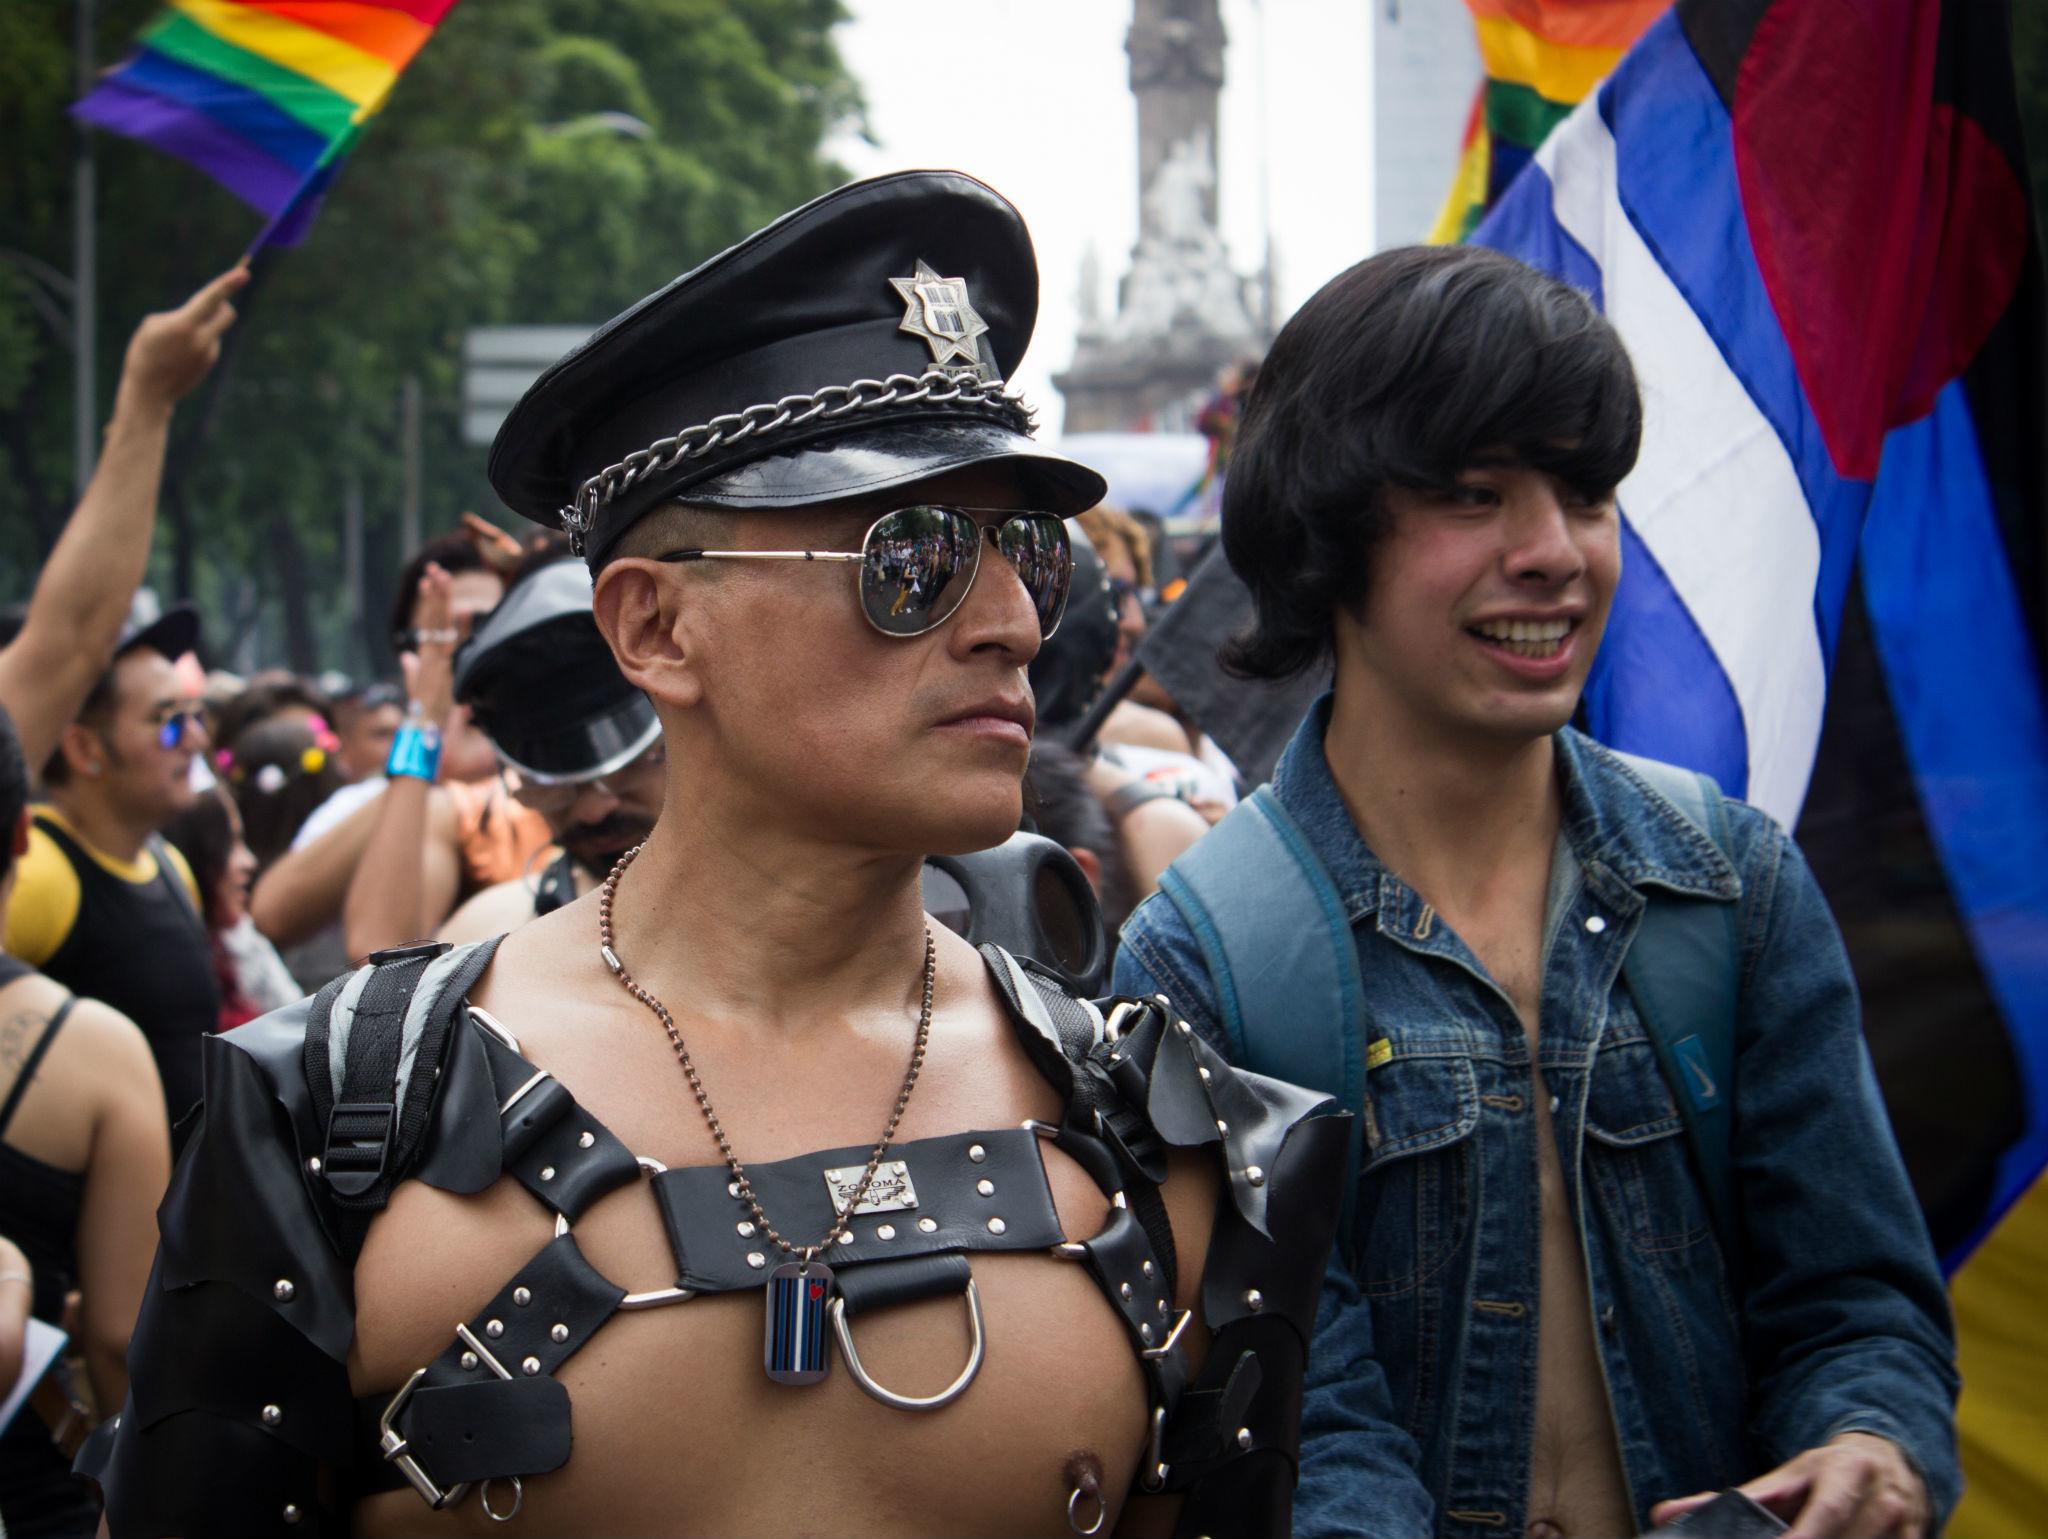 Leathers en la Marcha del Orgullo LGBTTTI en la CDMX